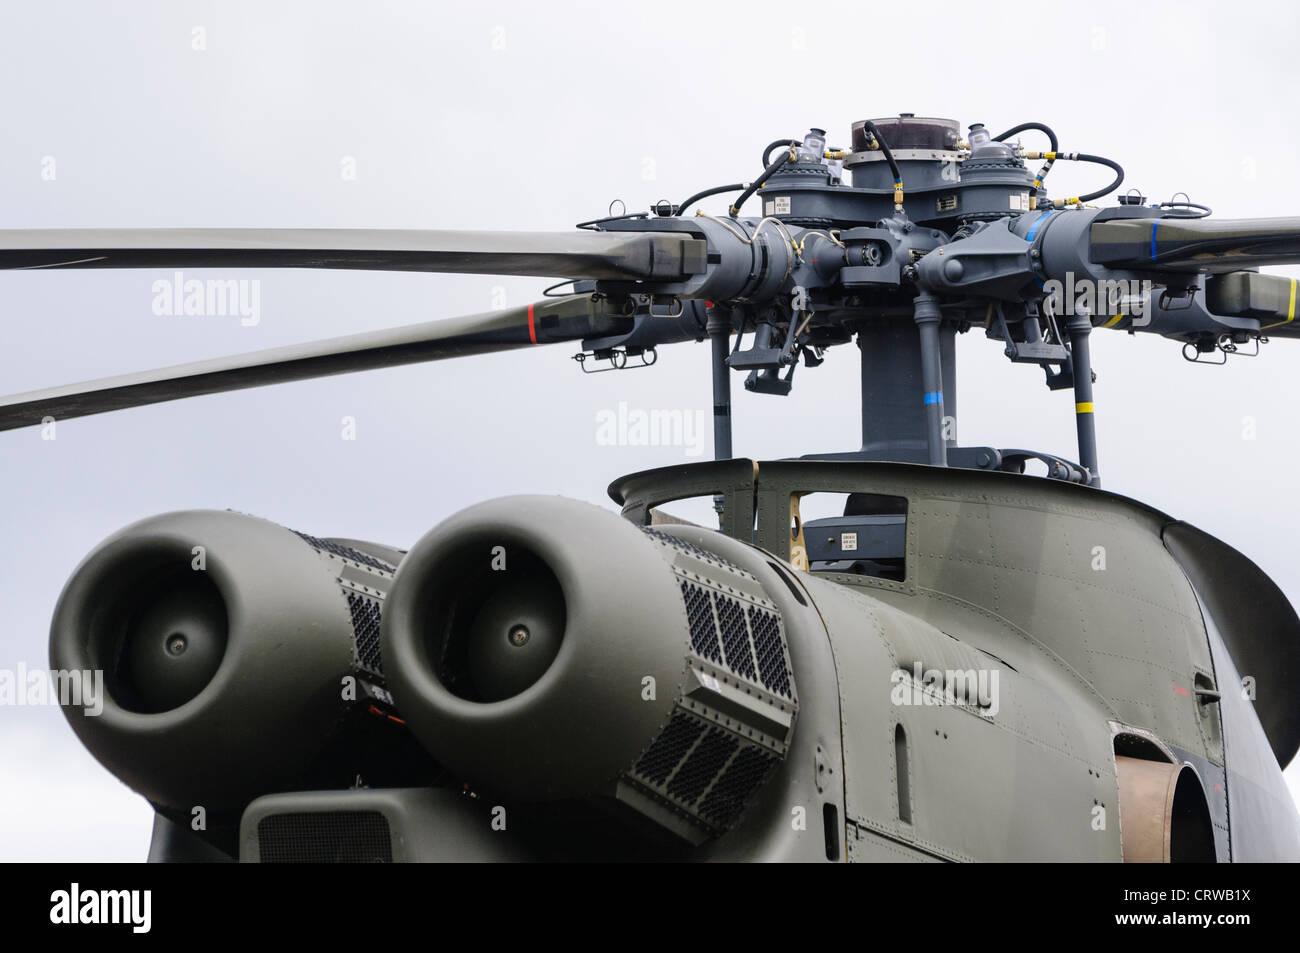 Royal Air Force Puma rotor and inlet detail - Stock Image